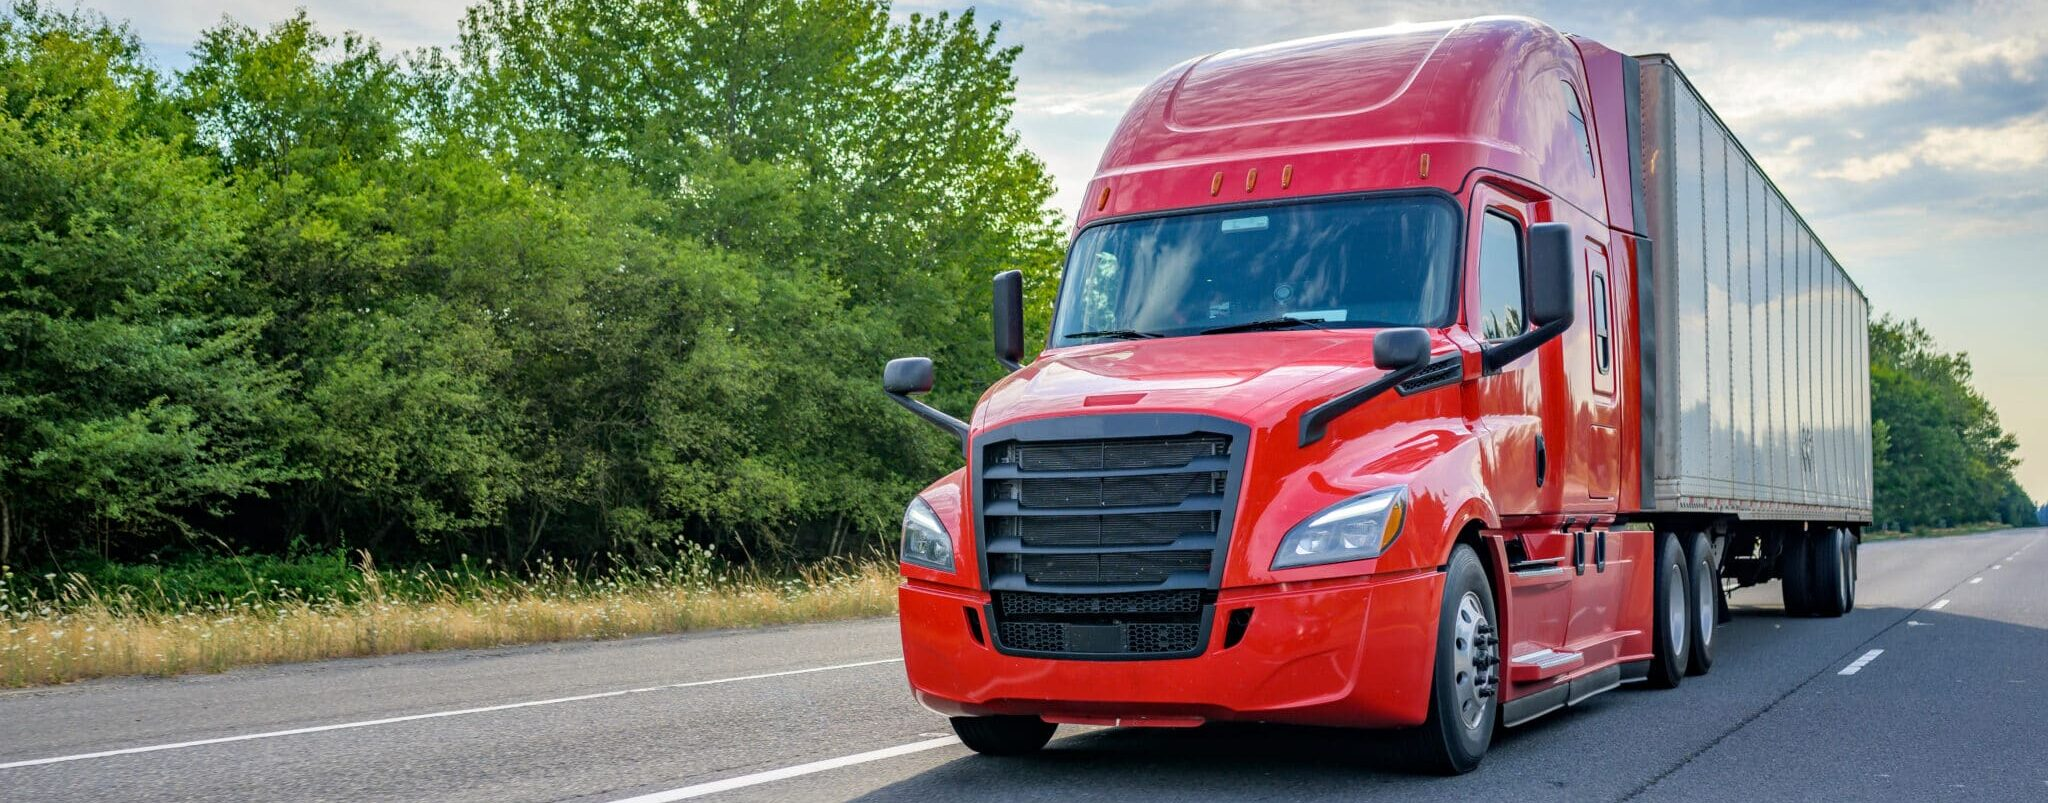 Q3 2021 freight market